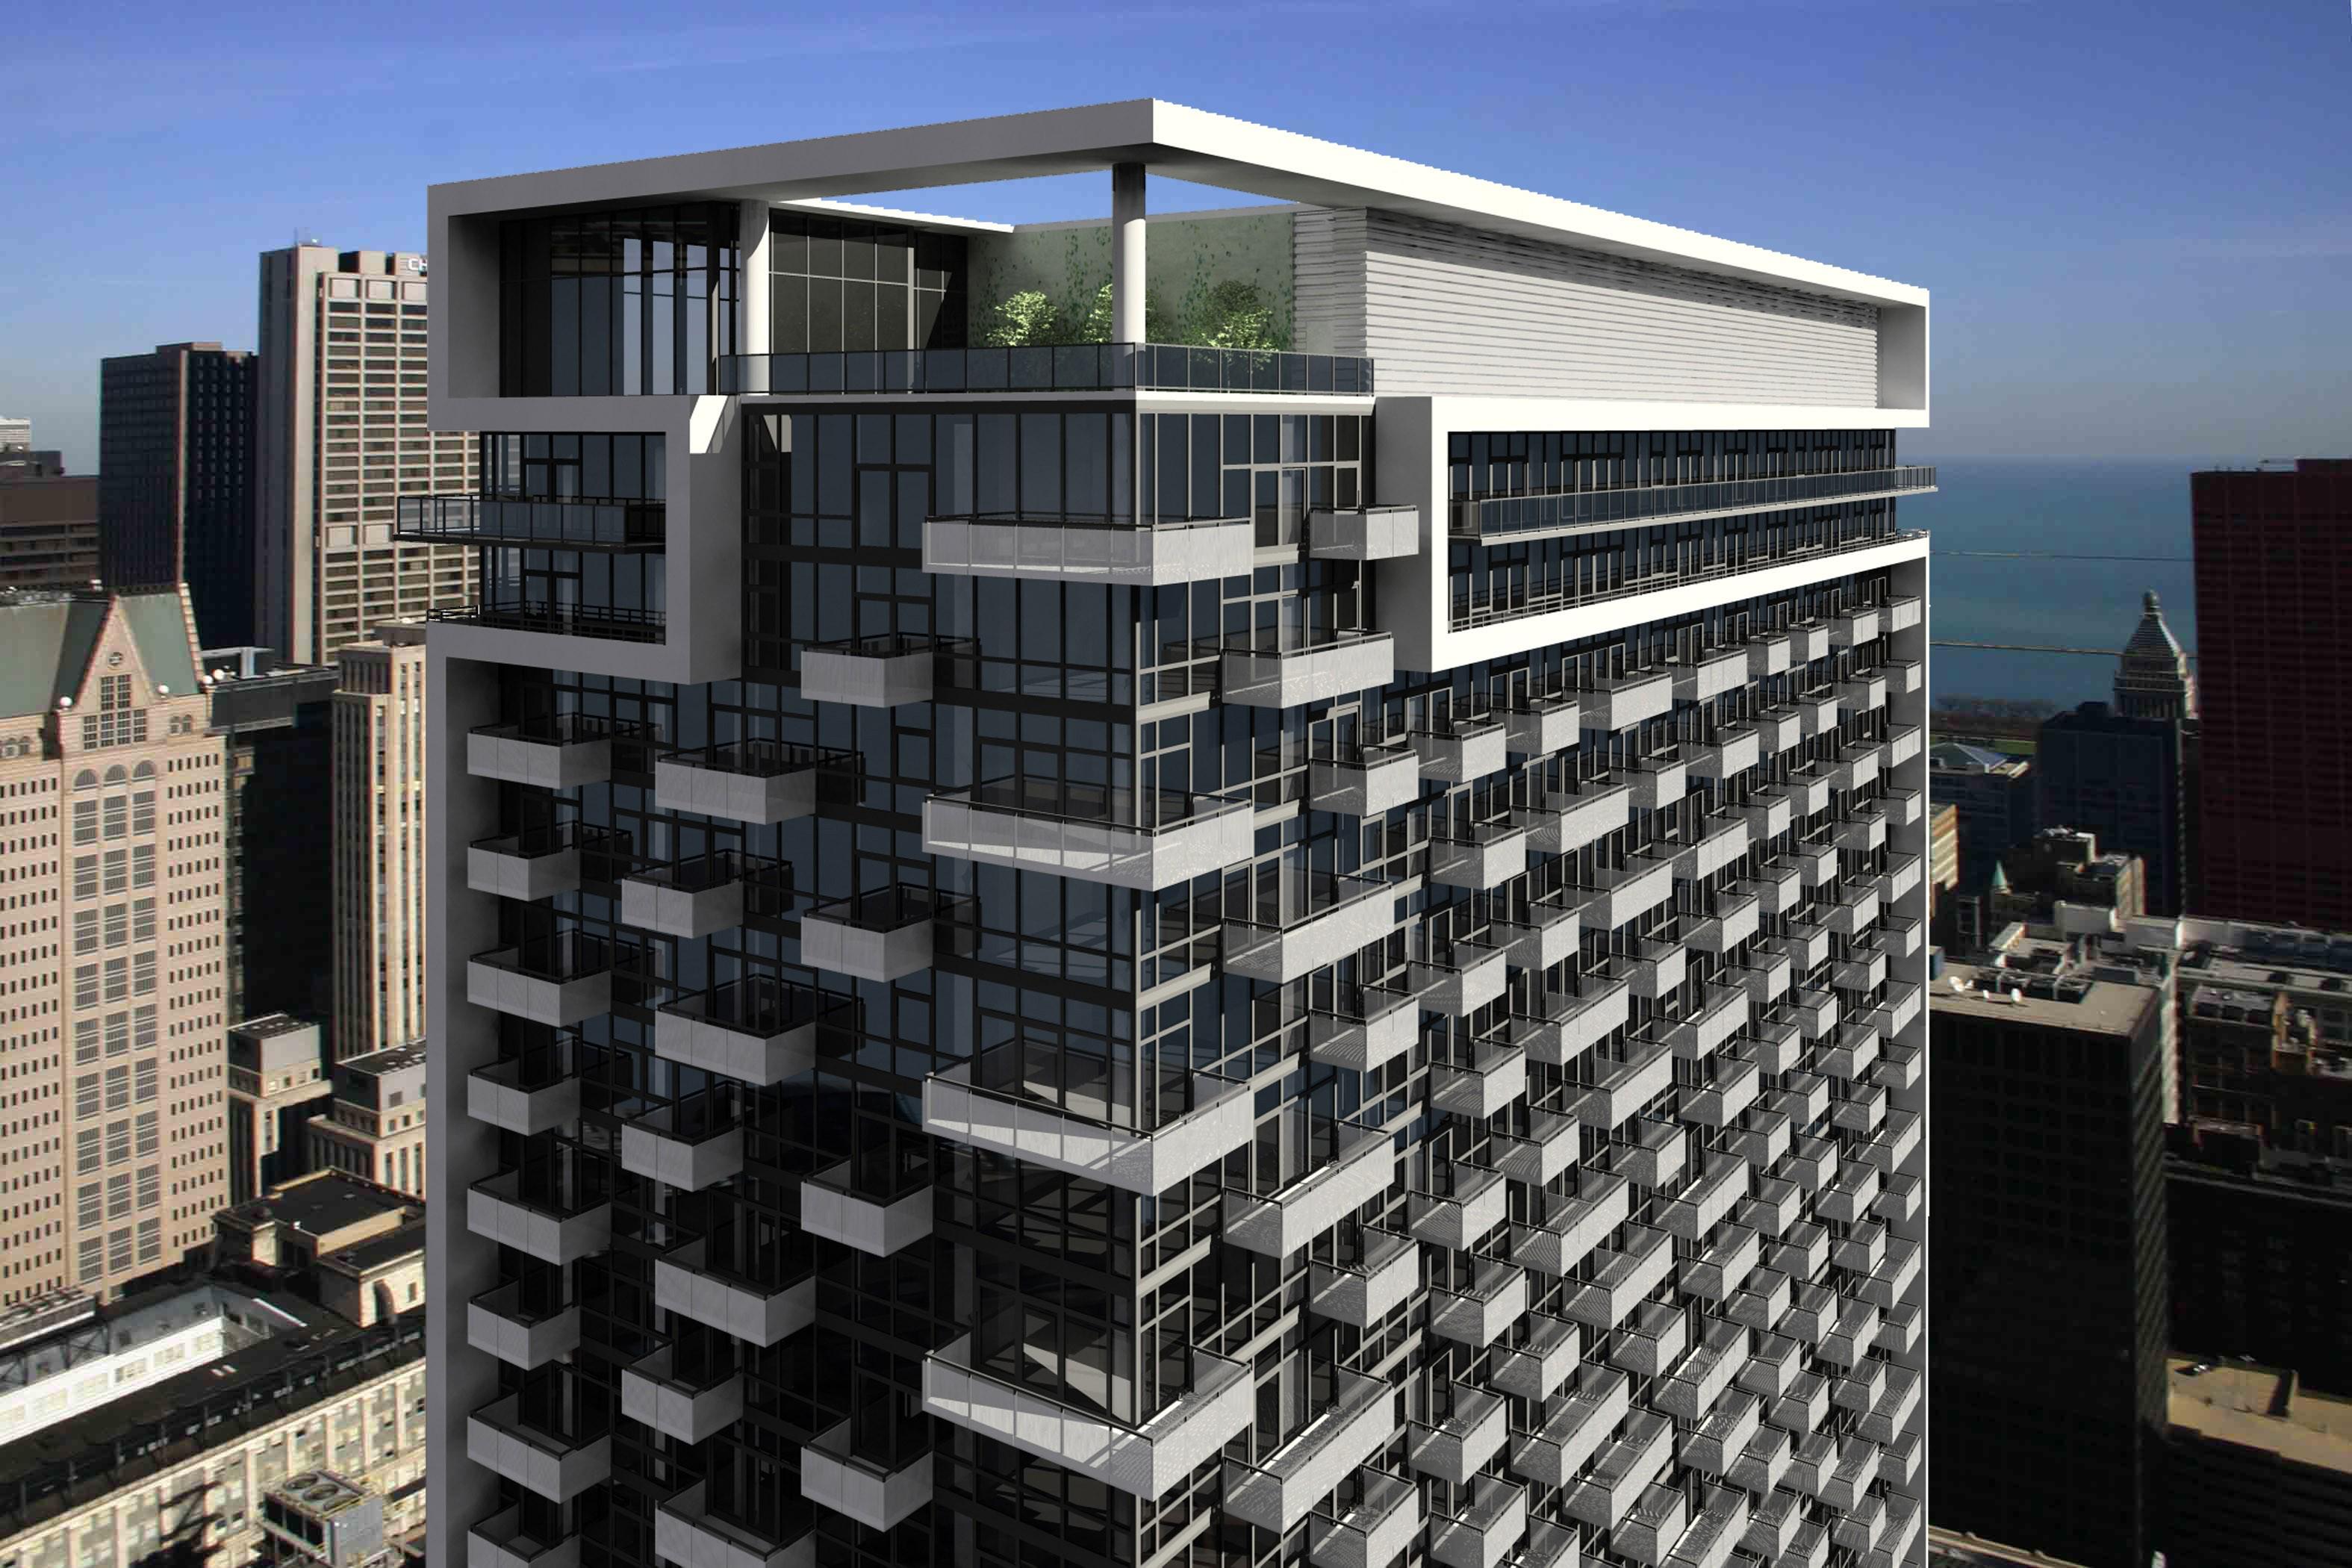 Lower prices, closing credits, and broker bonuses on 235 Van Buren's condos